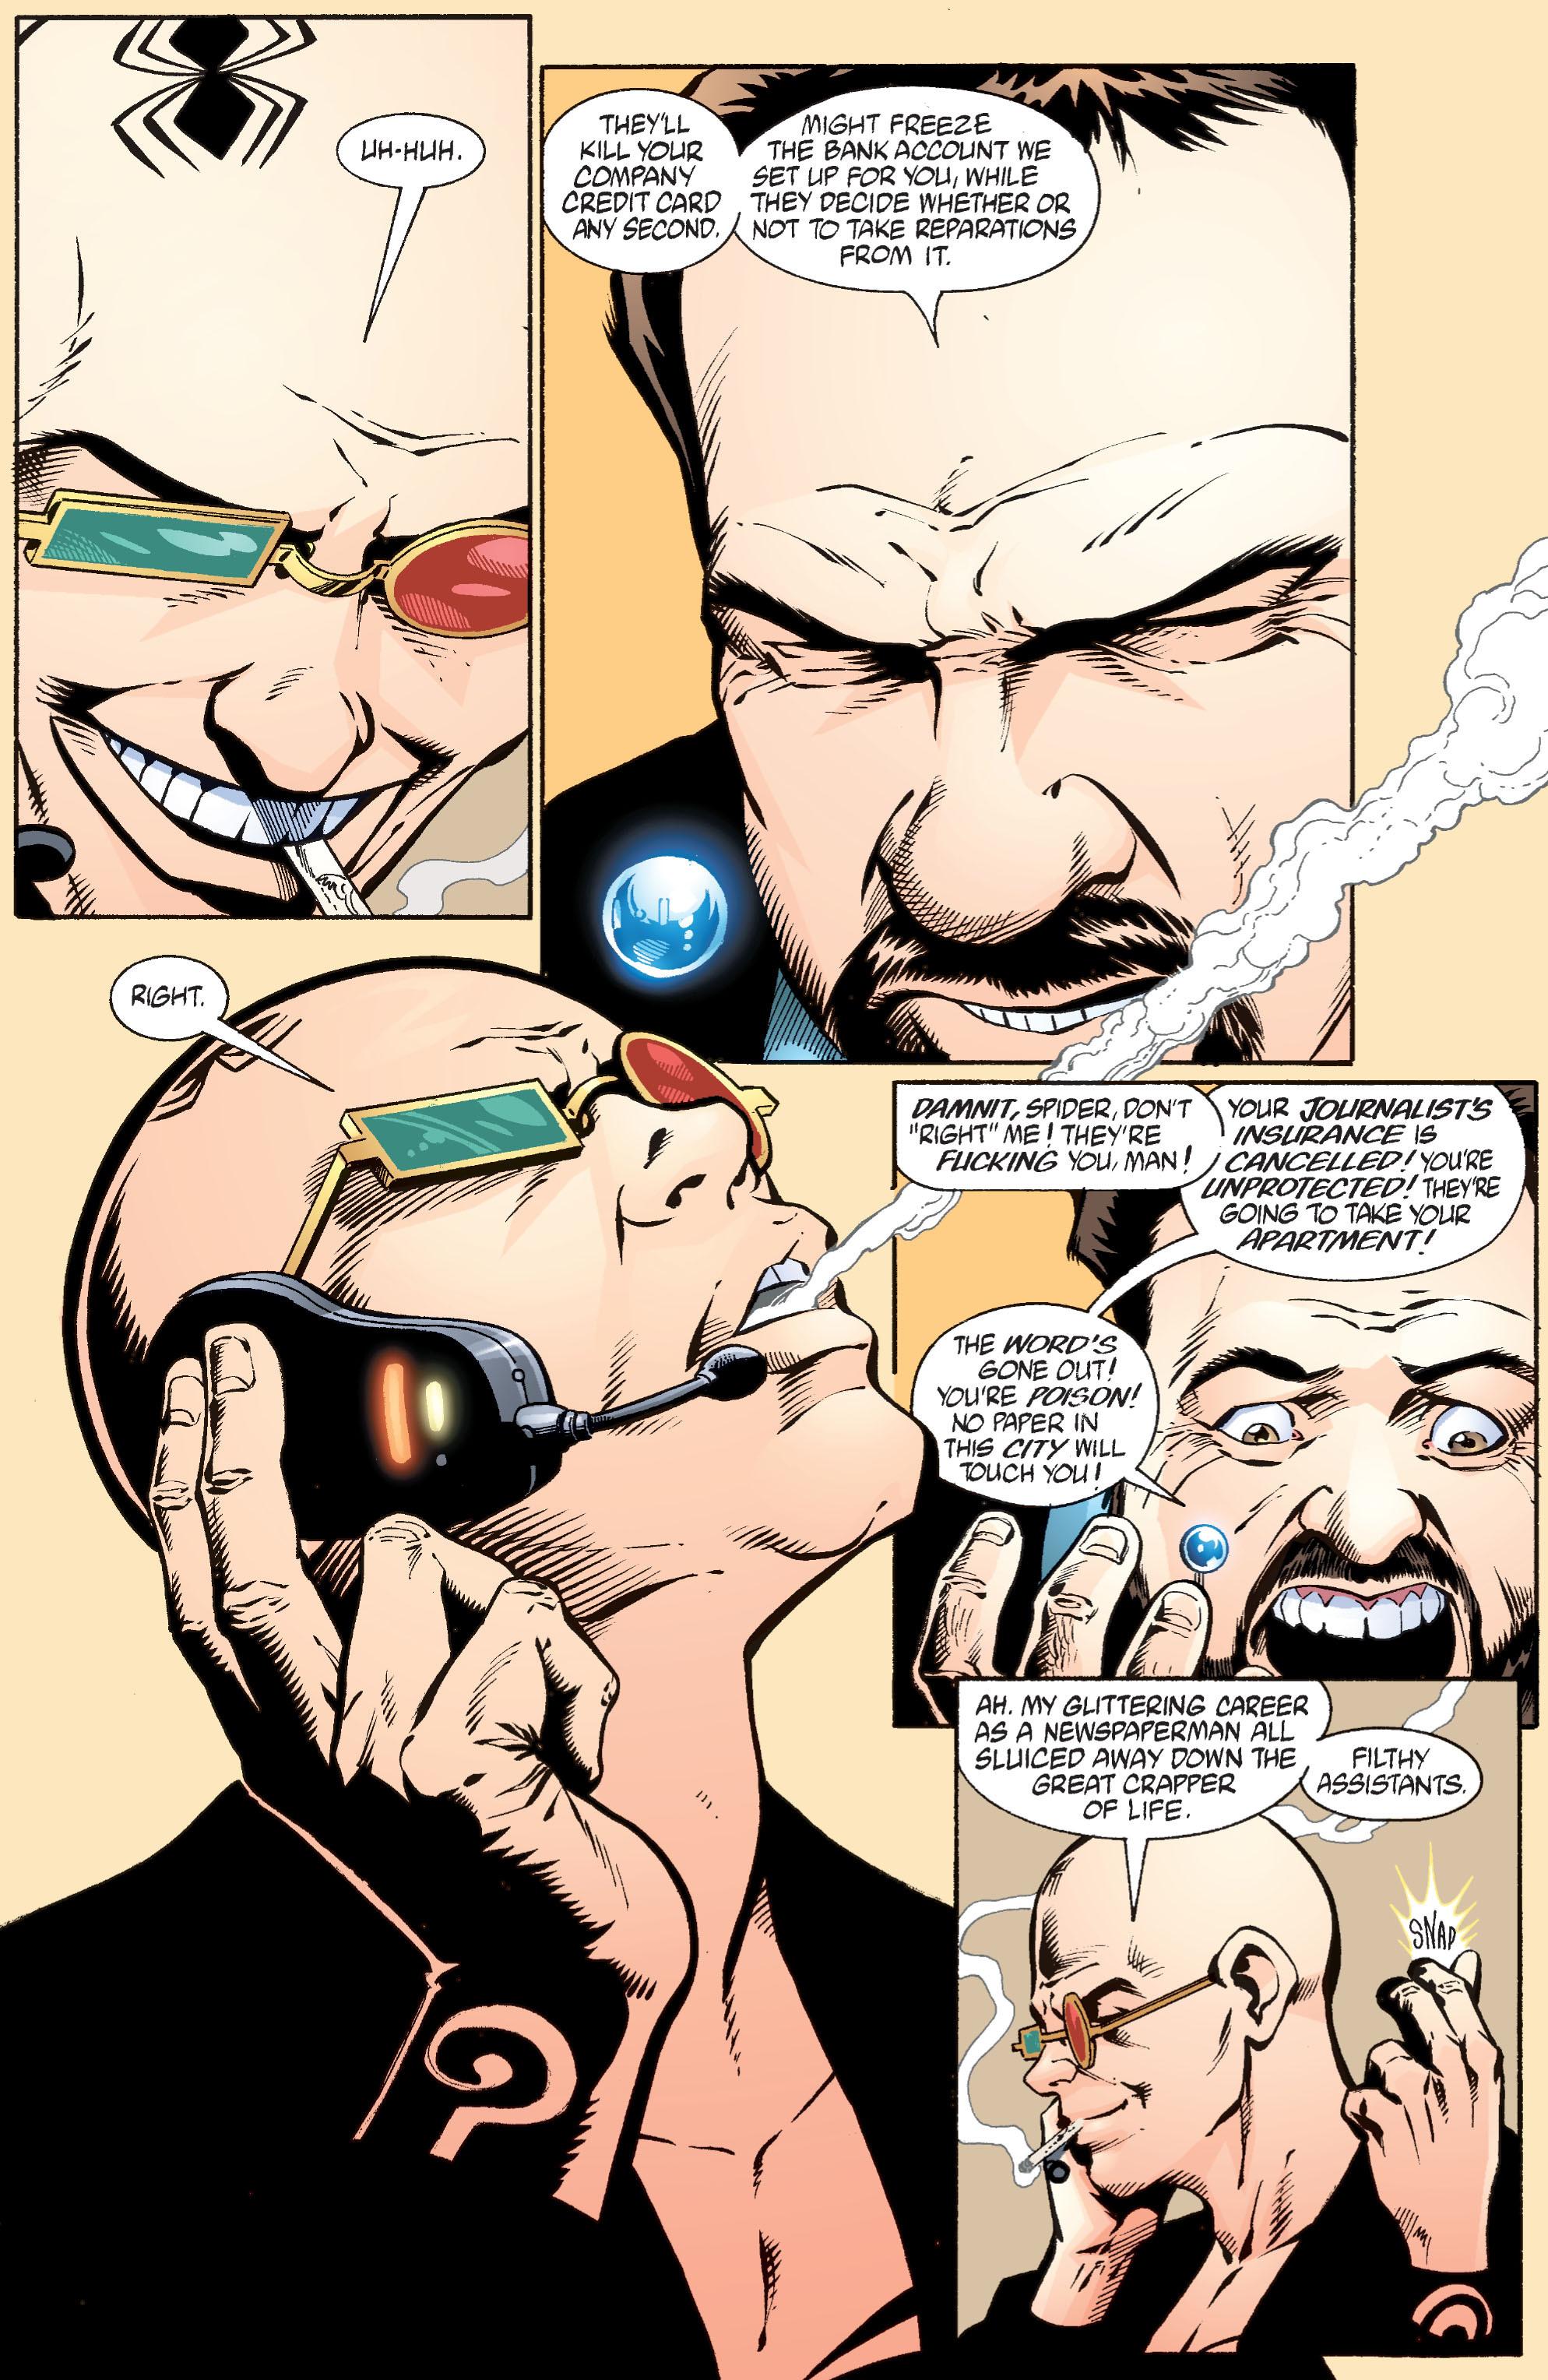 Read online Transmetropolitan comic -  Issue #36 - 19